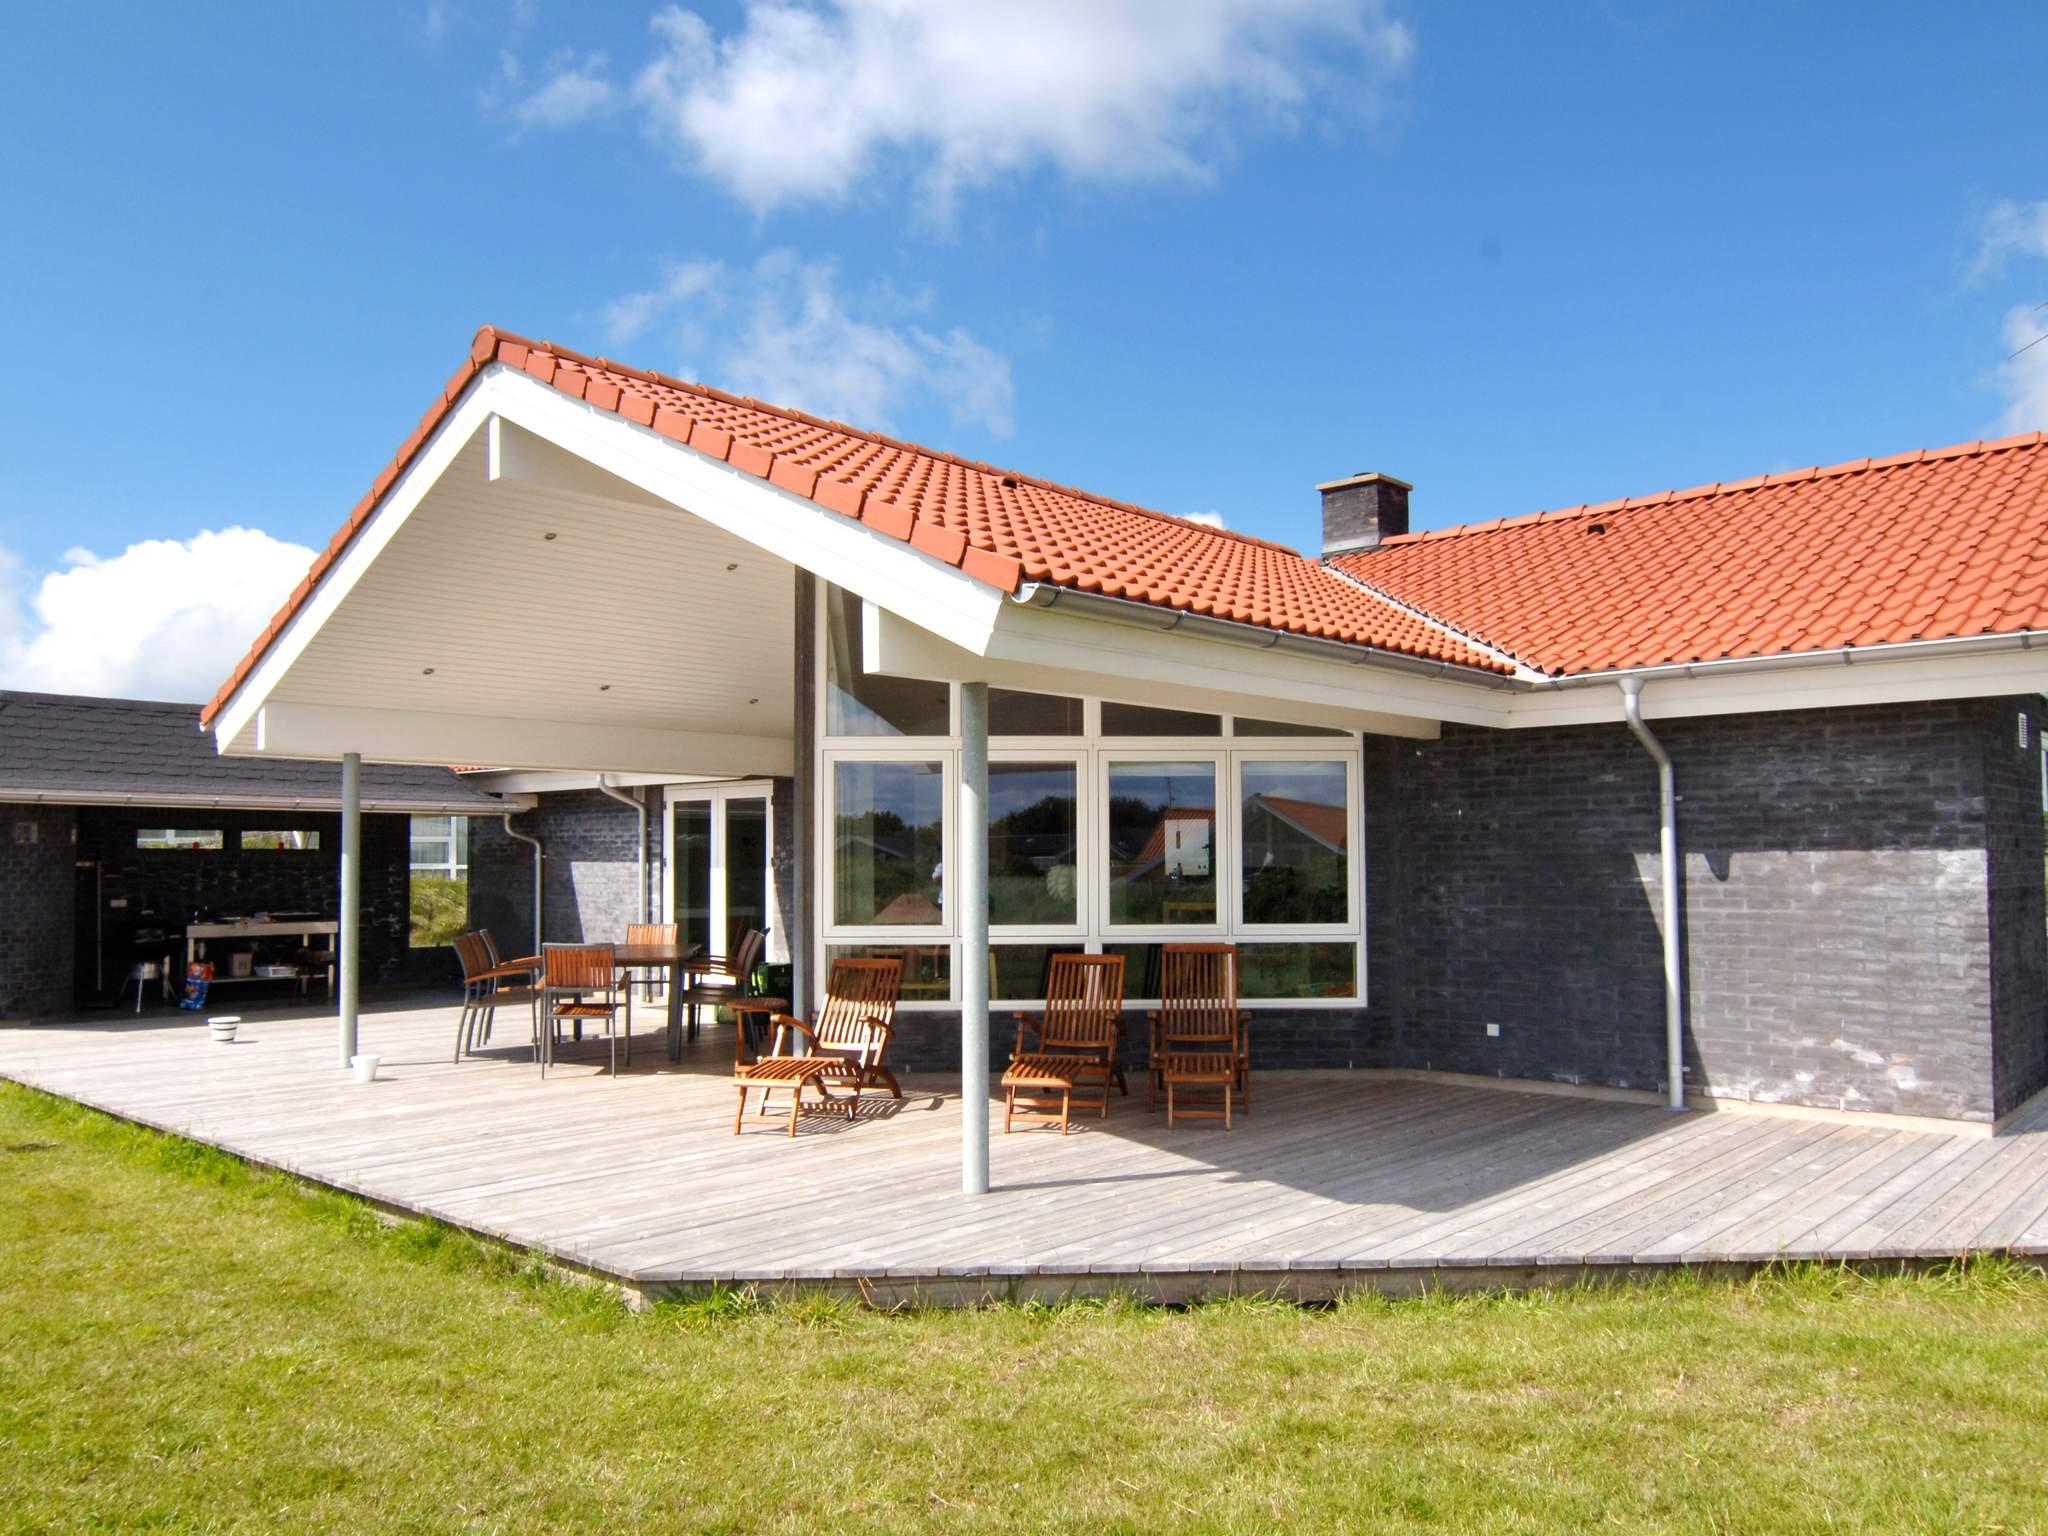 Ferienhaus Haurvig (125276), Hvide Sande, , Westjütland, Dänemark, Bild 16